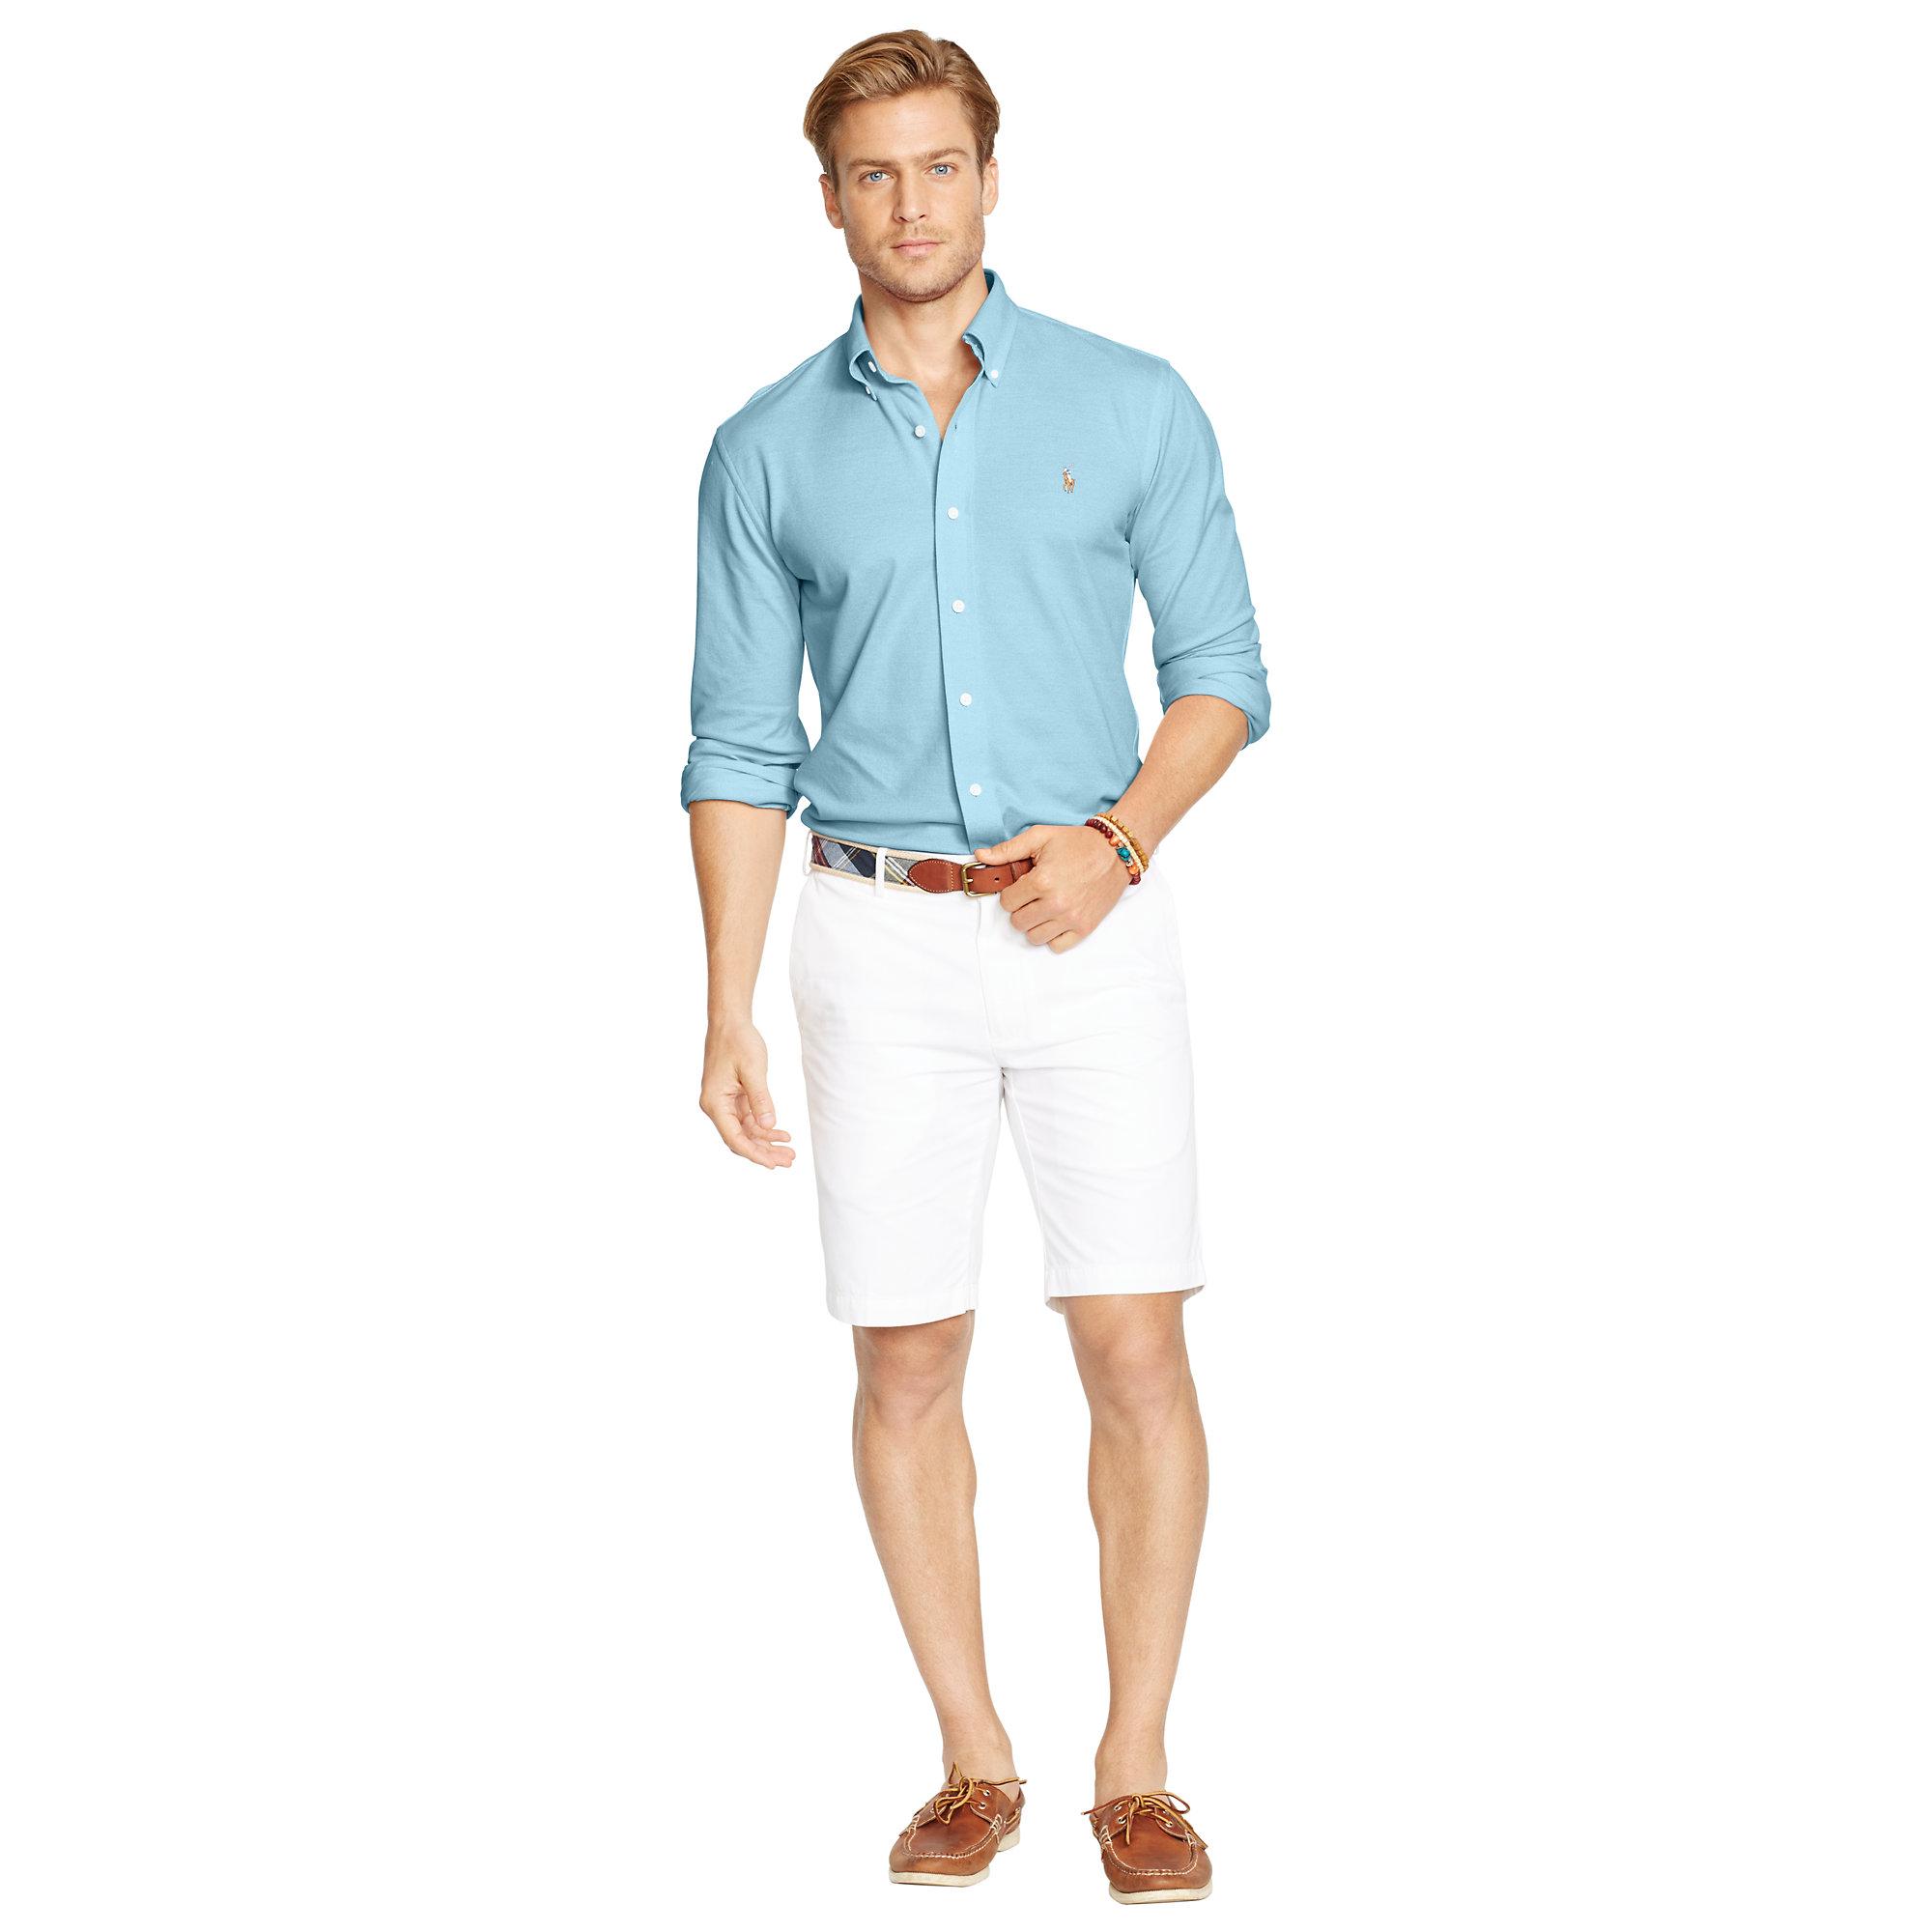 Polo Ralph Lauren Knit Oxford Shirt in Blue for Men - Lyst